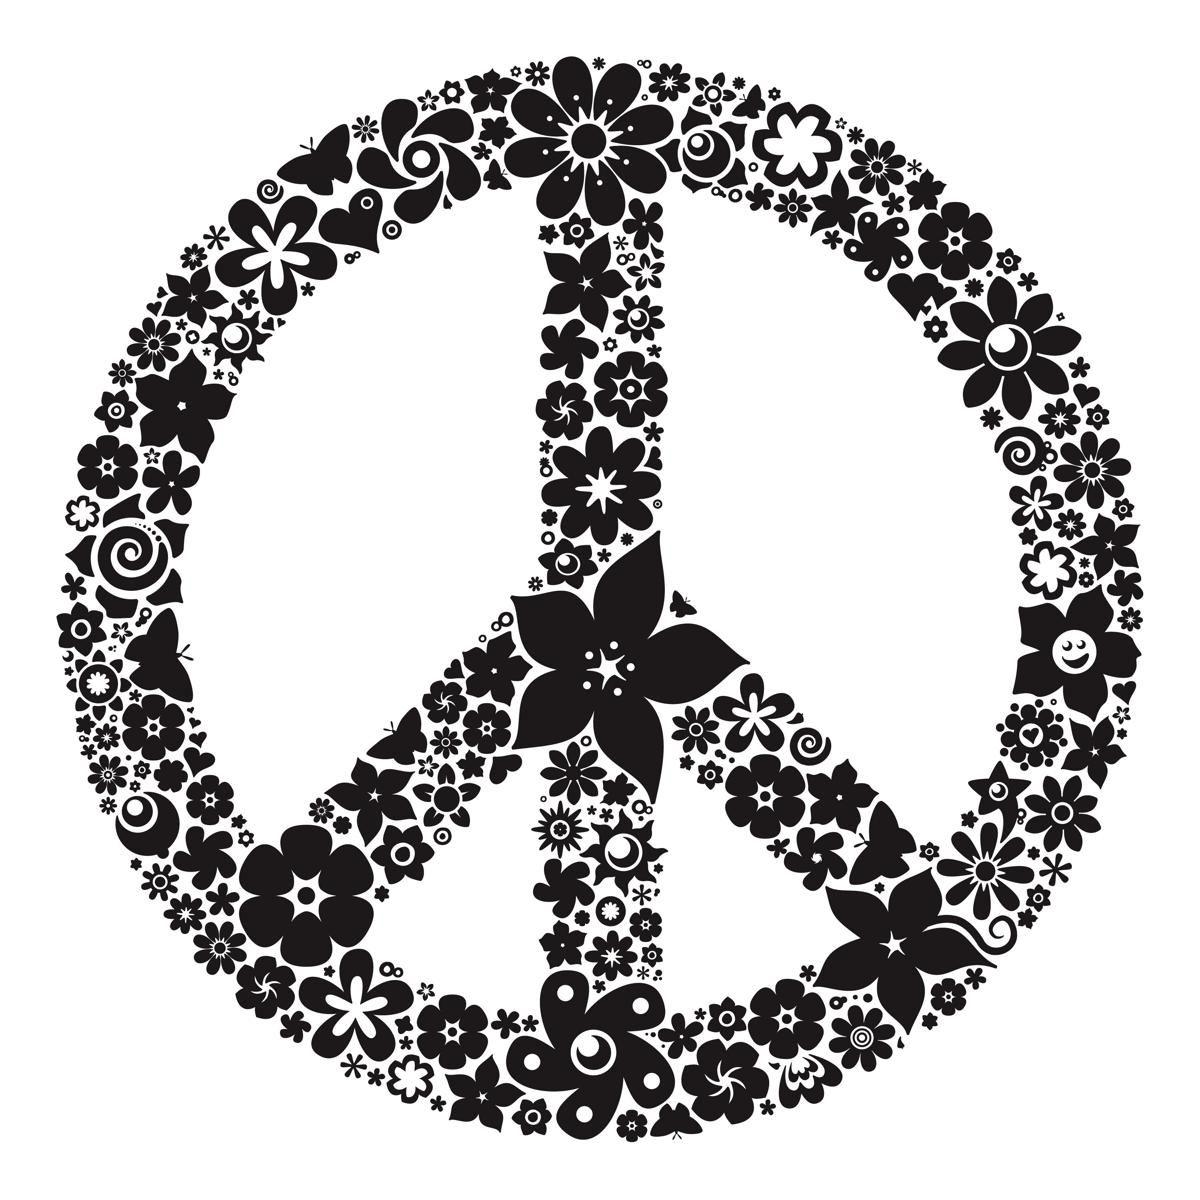 Flower Power Tatoo Pinterest Peace Sign Tattoos Tatoo And Tattoo